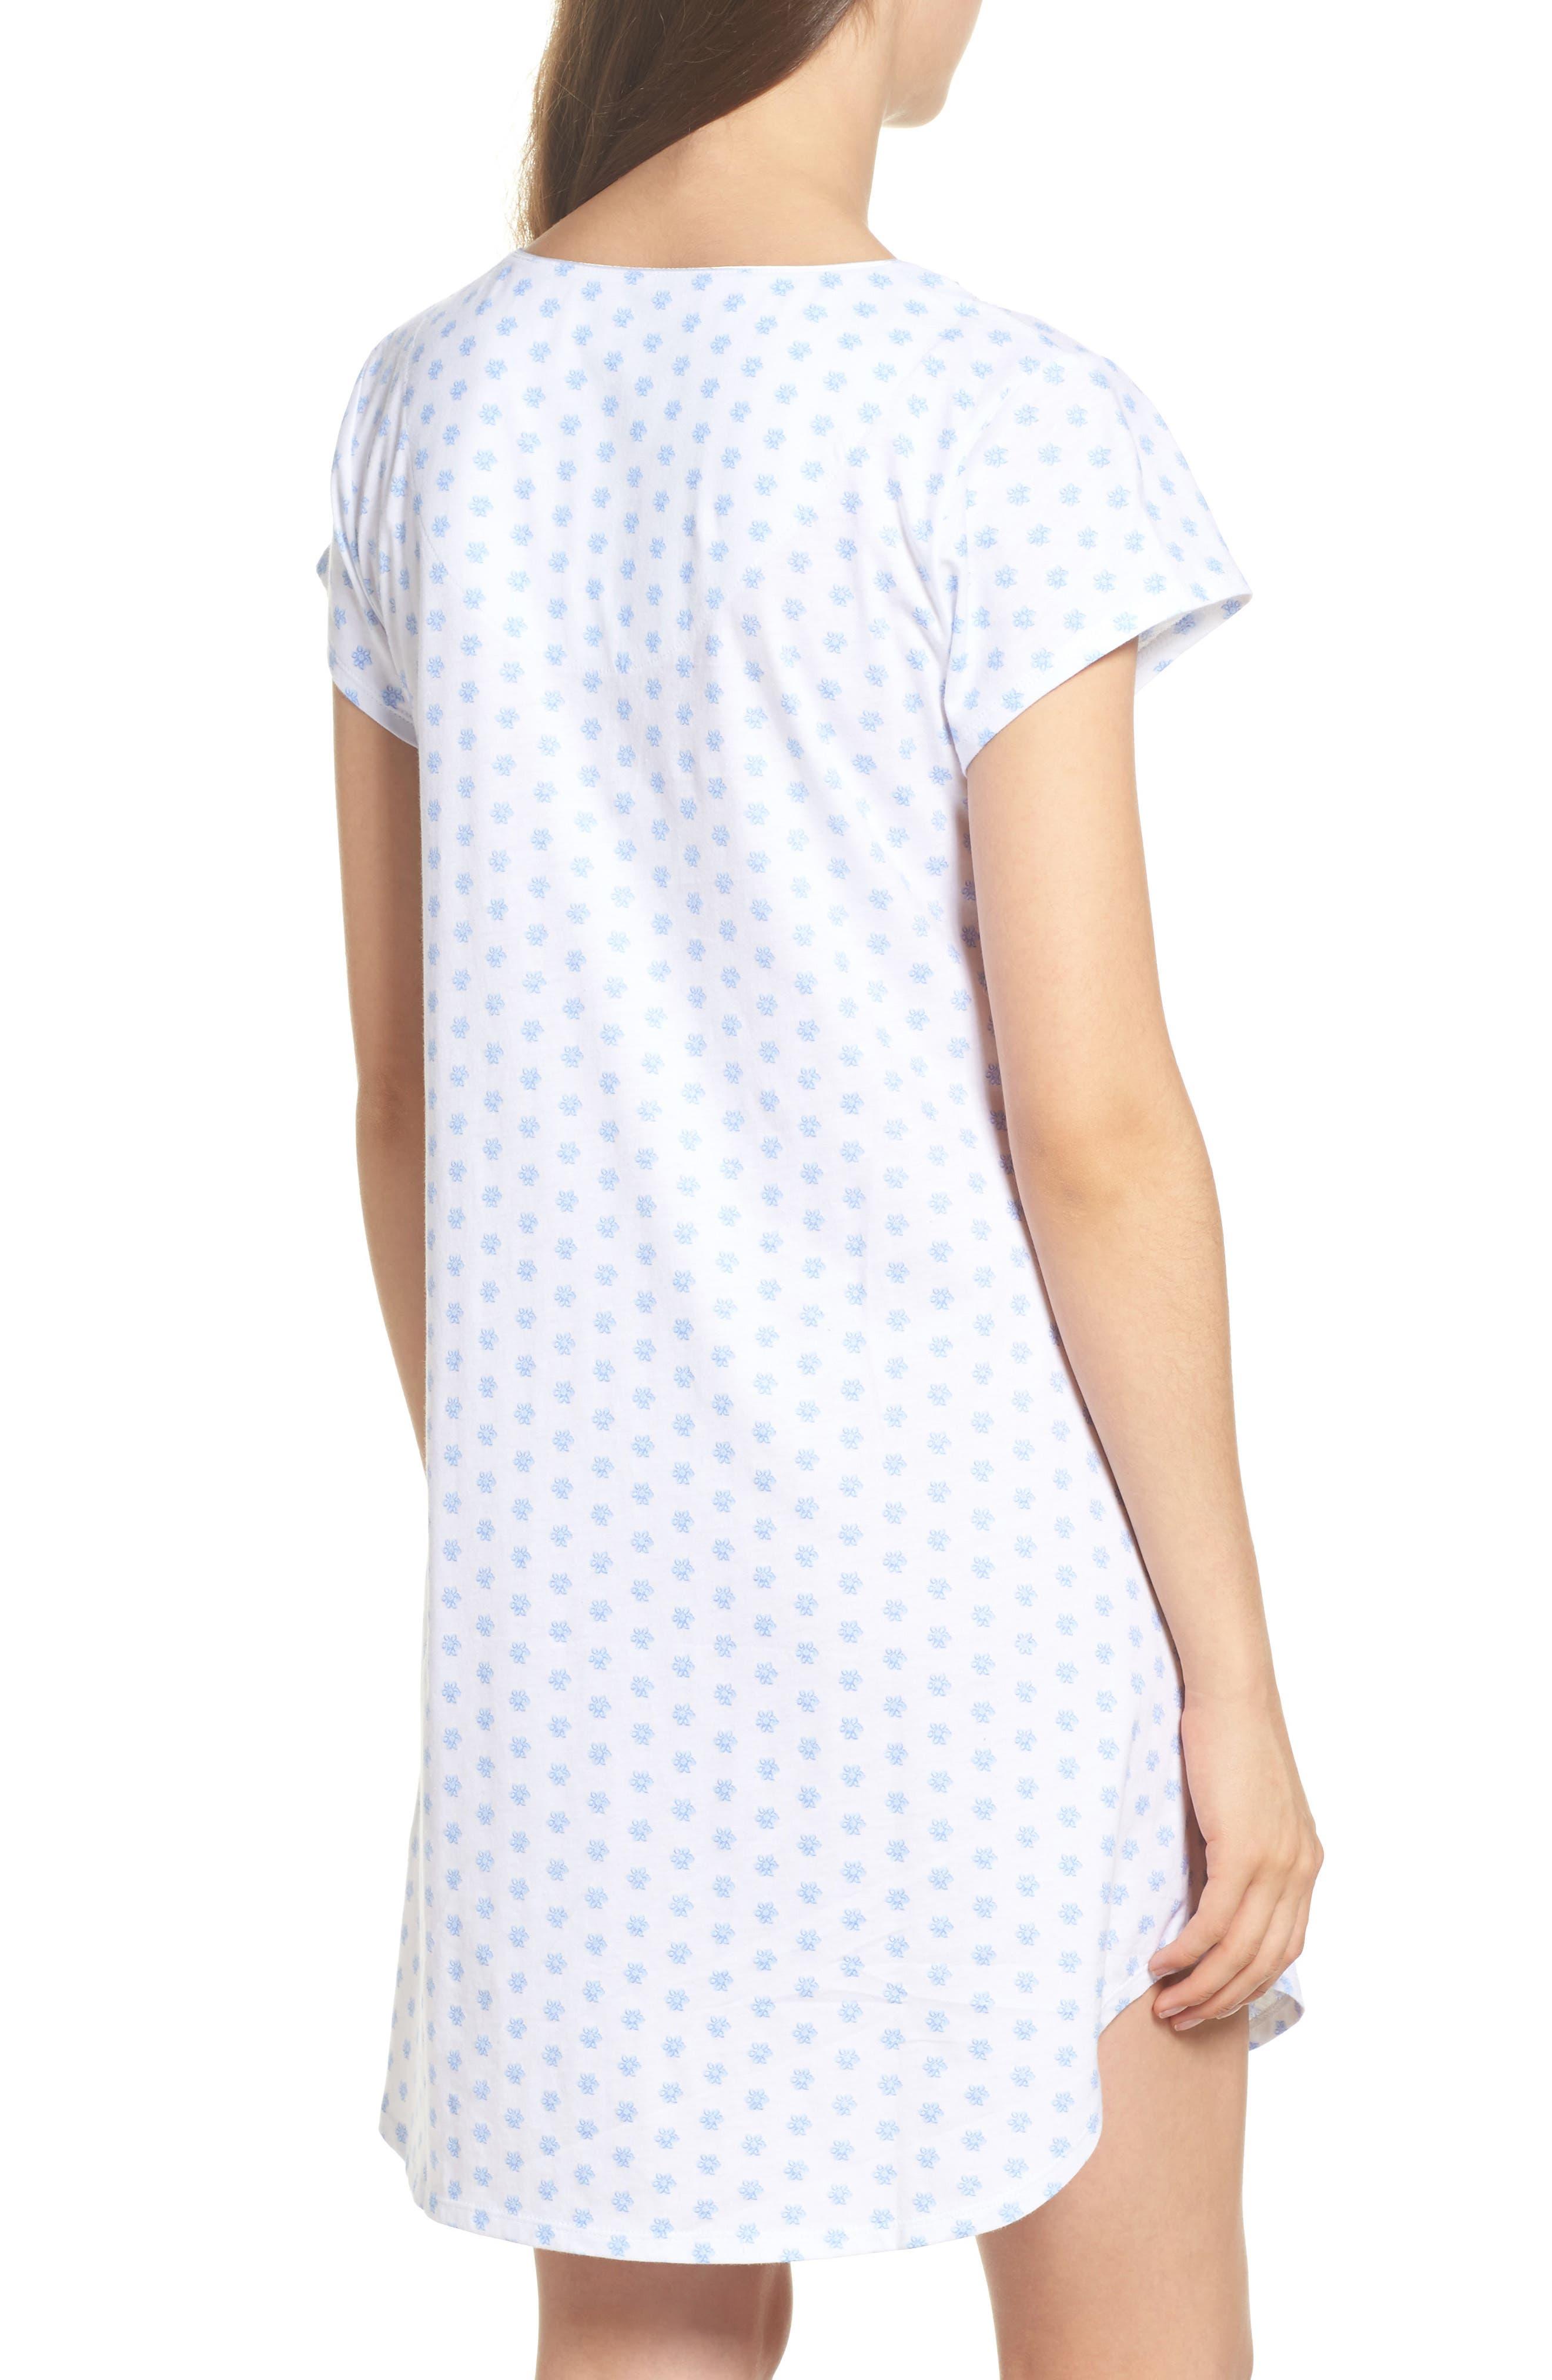 Jersey Sleep Shirt,                             Alternate thumbnail 2, color,                             White Blue Geo